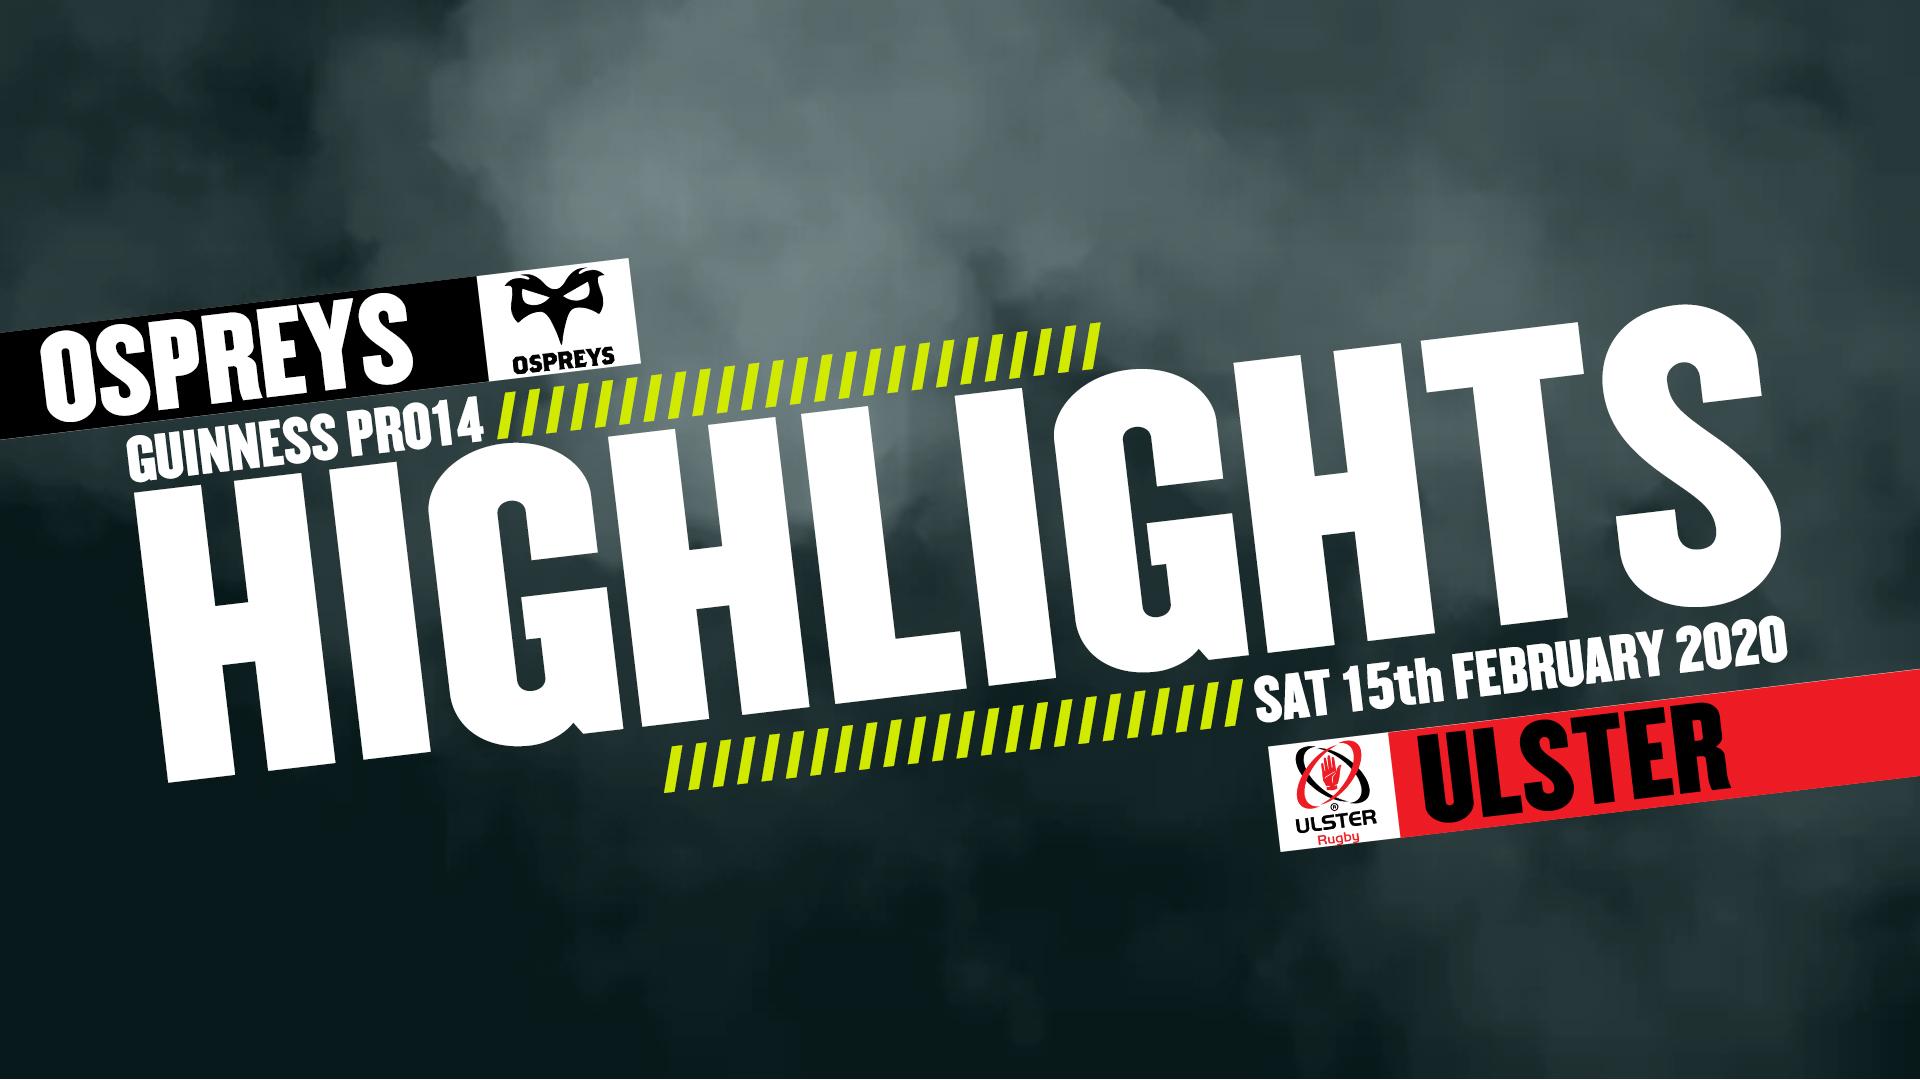 Ulster Highlights